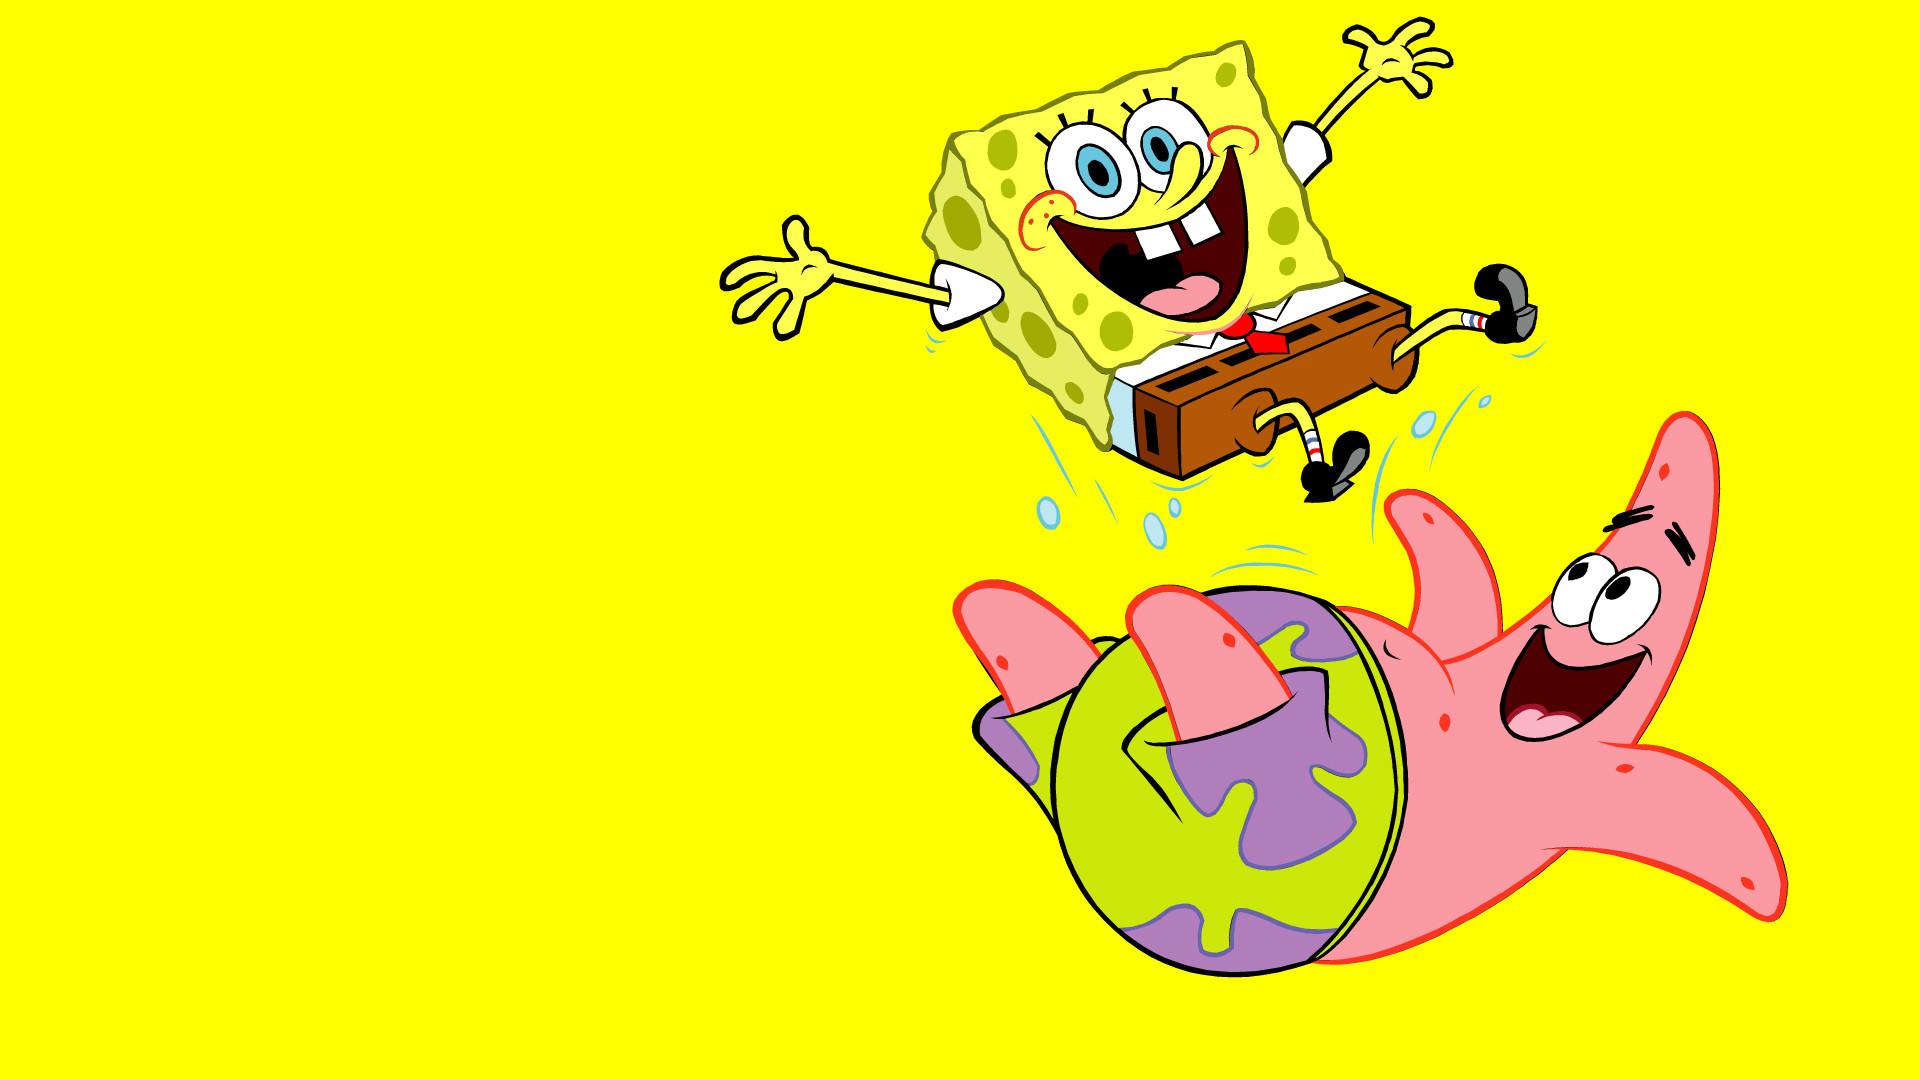 Gambar Wallpaper Kartun Spongebob - Kumpulan Wallpaper